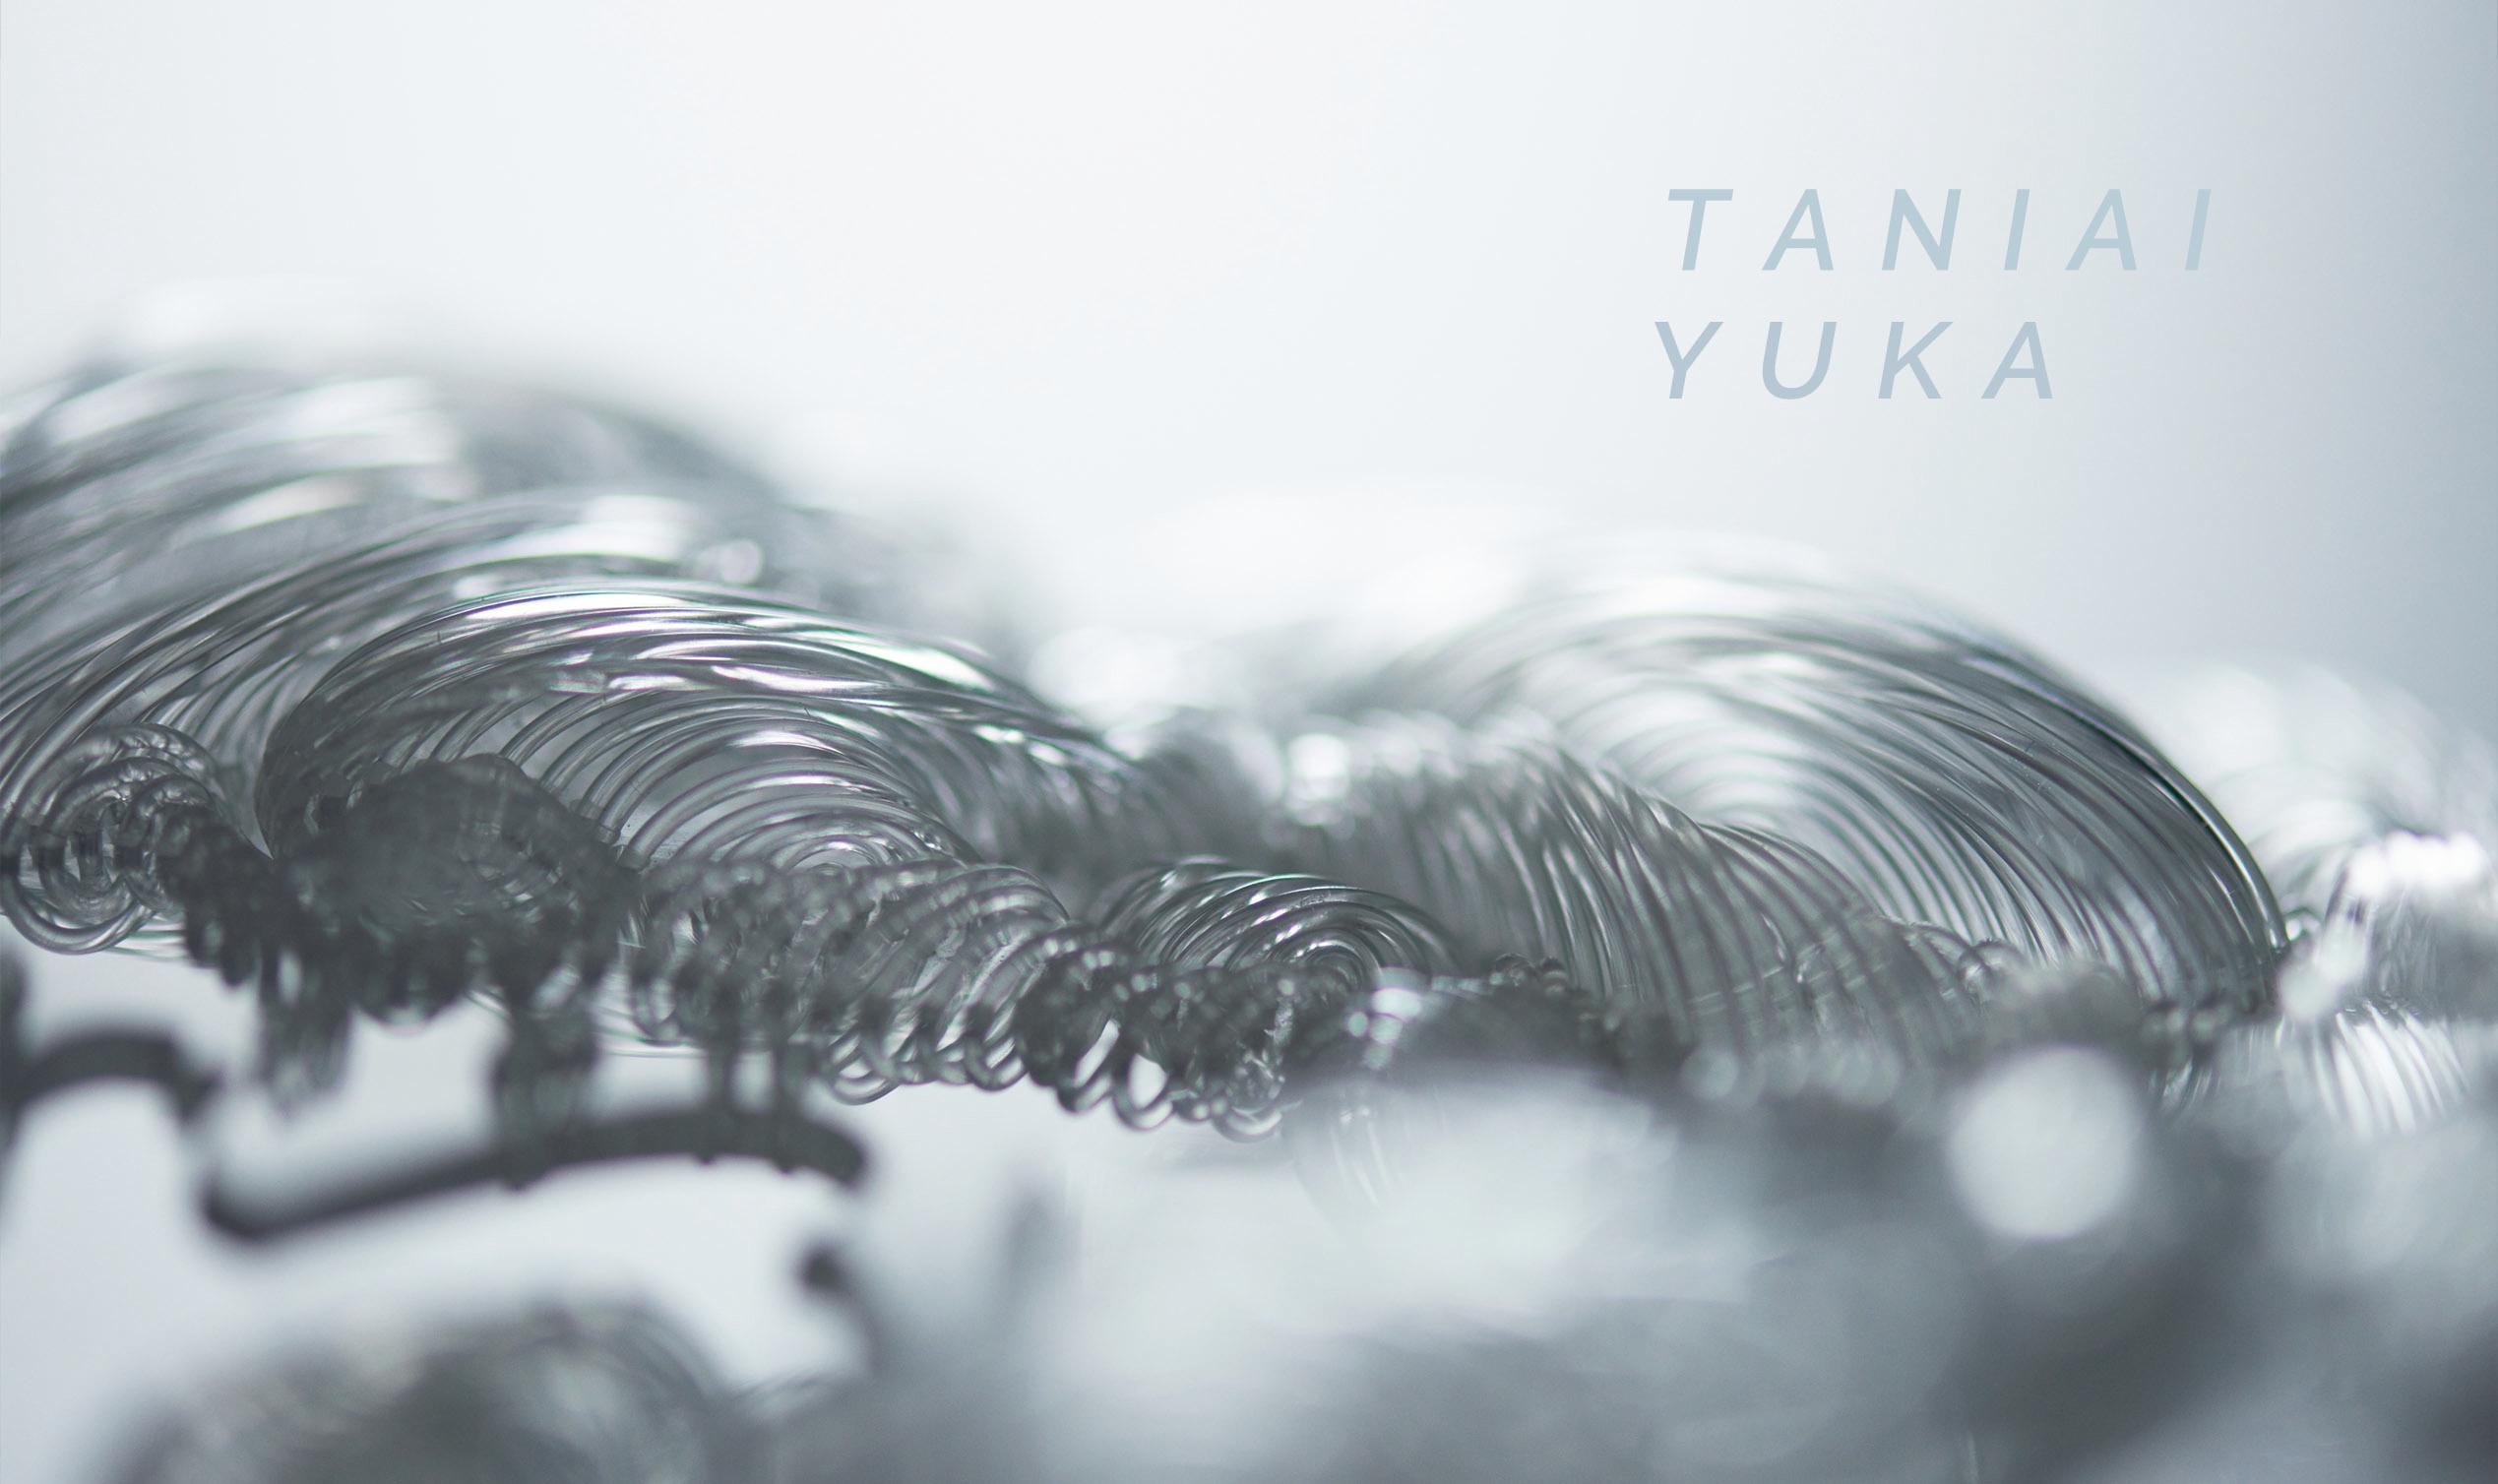 YUKA TANIAI   ☝Click